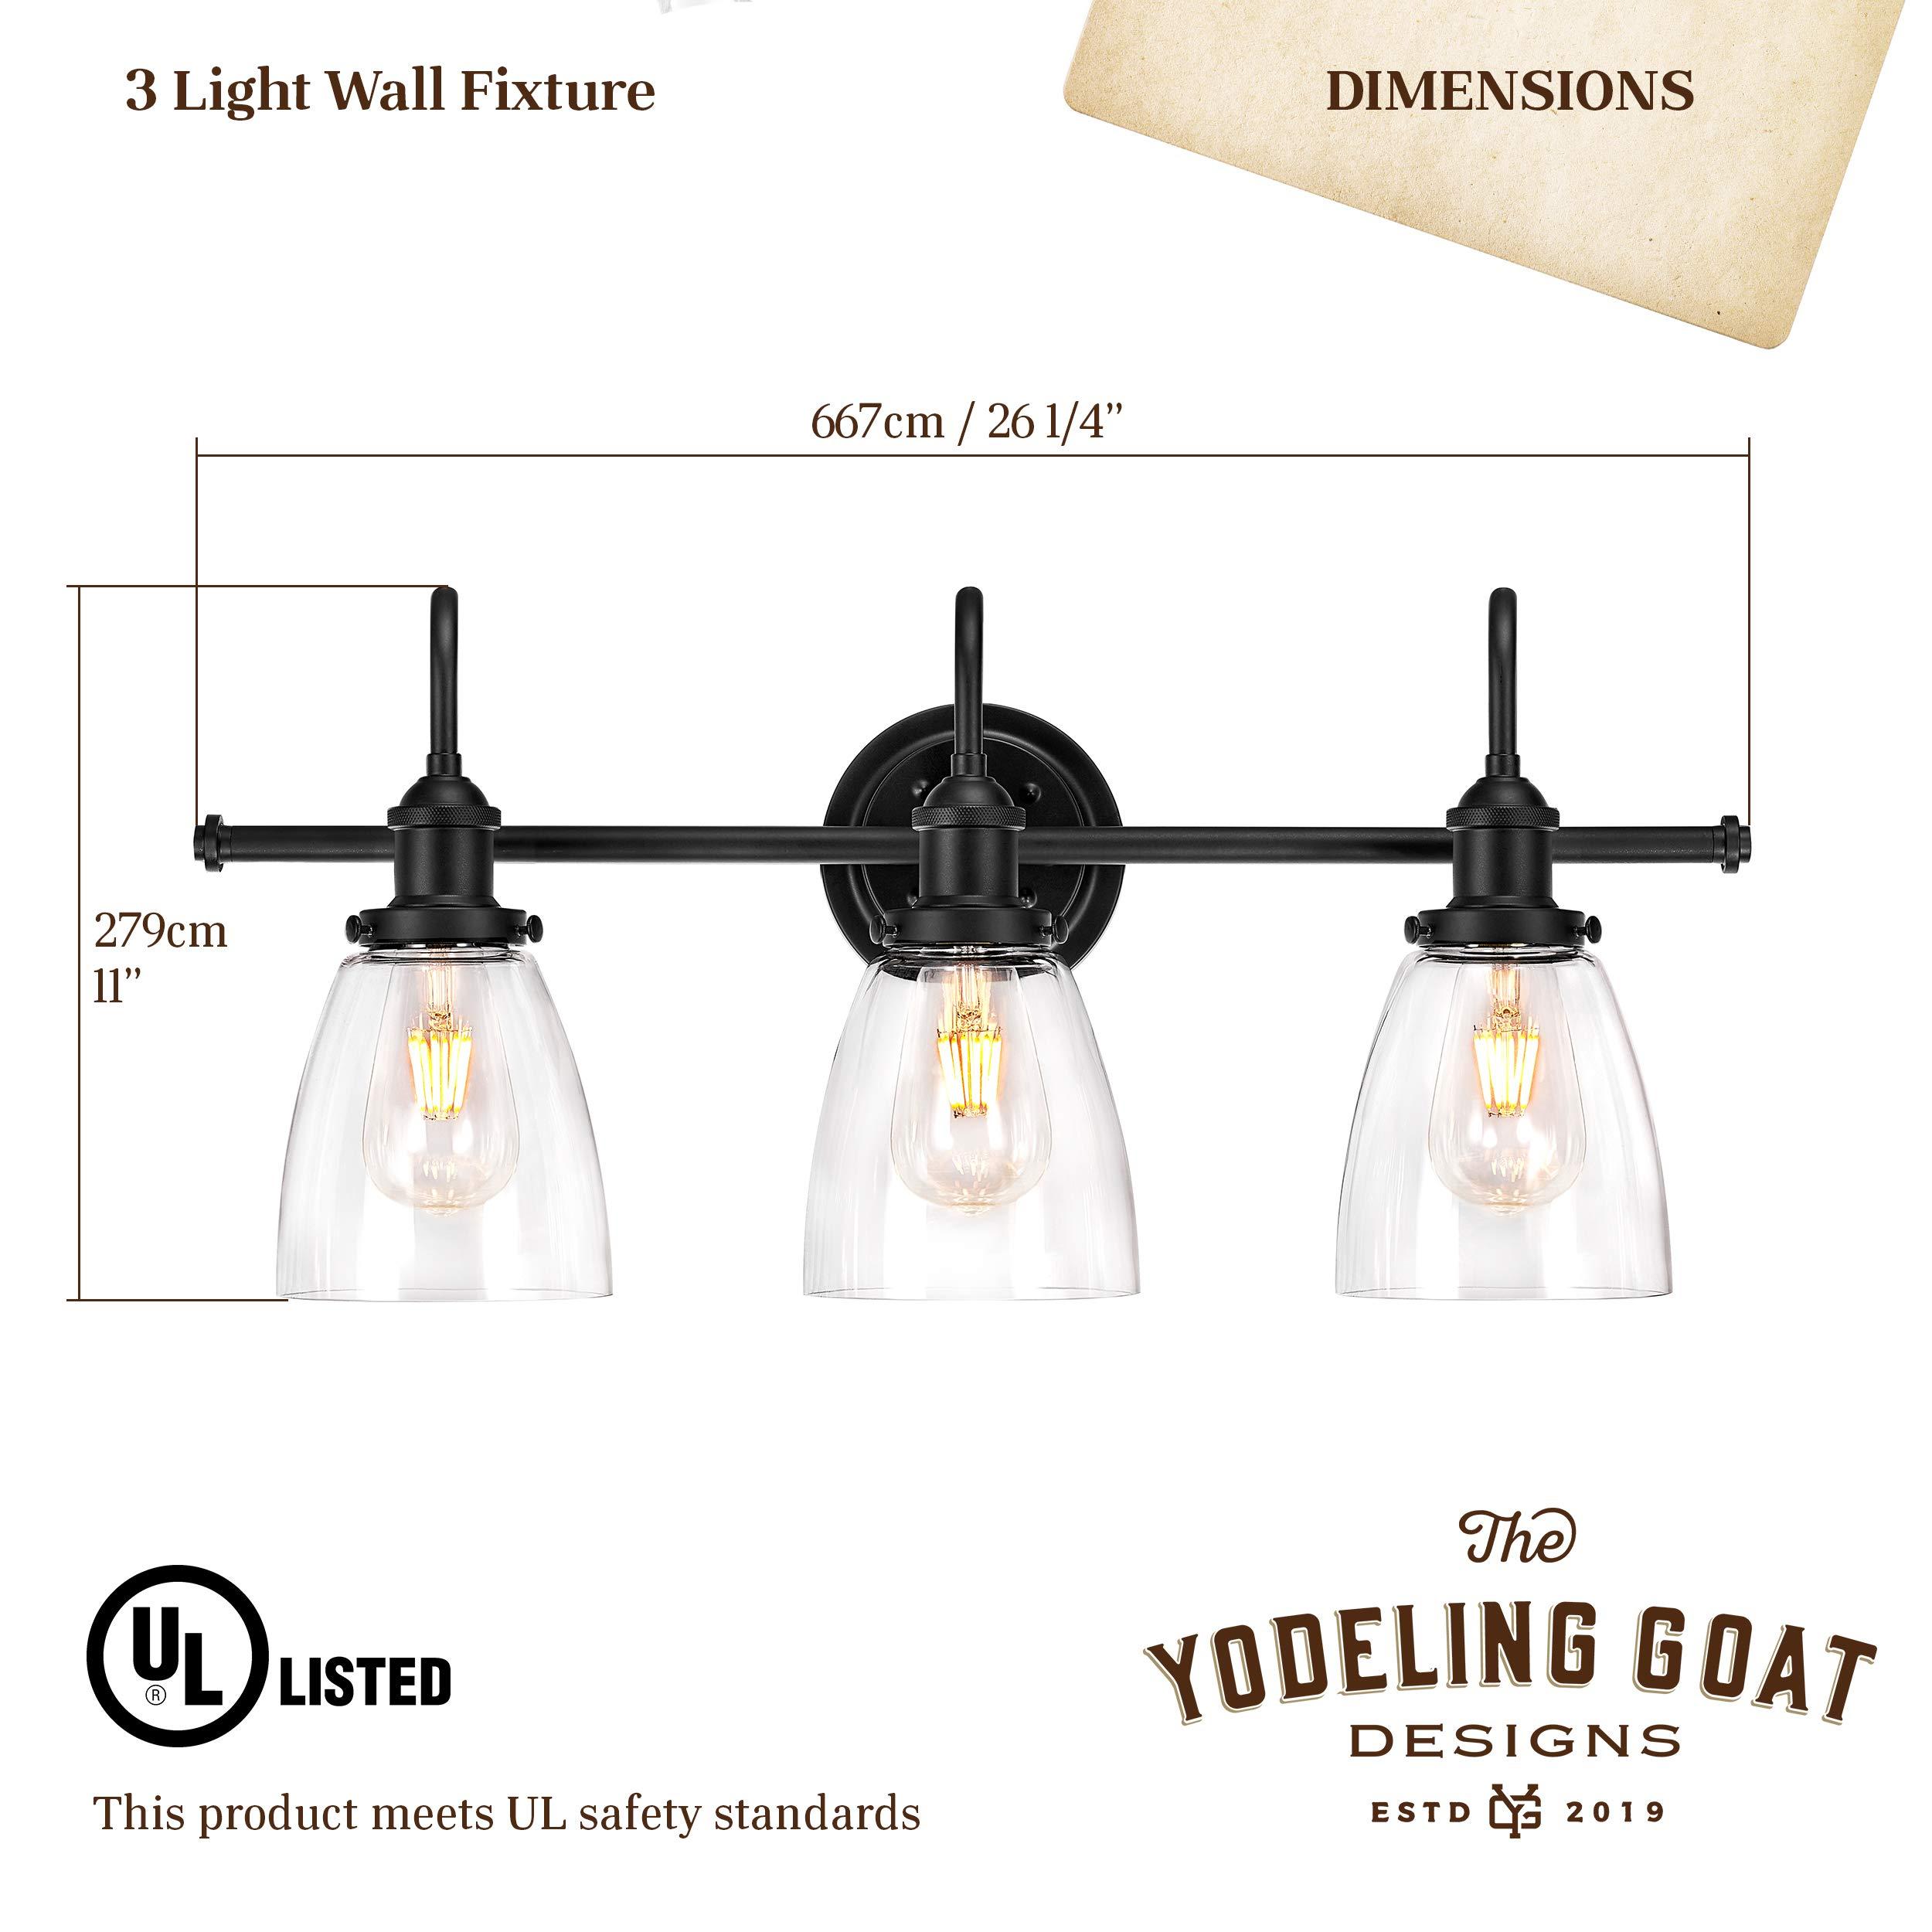 Bathroom Light Fixture - Farmhouse, Vintage, Industrial - 3 Light Bathroom Black Vanity Light Fixture by The Yodeling Goat (Image #6)